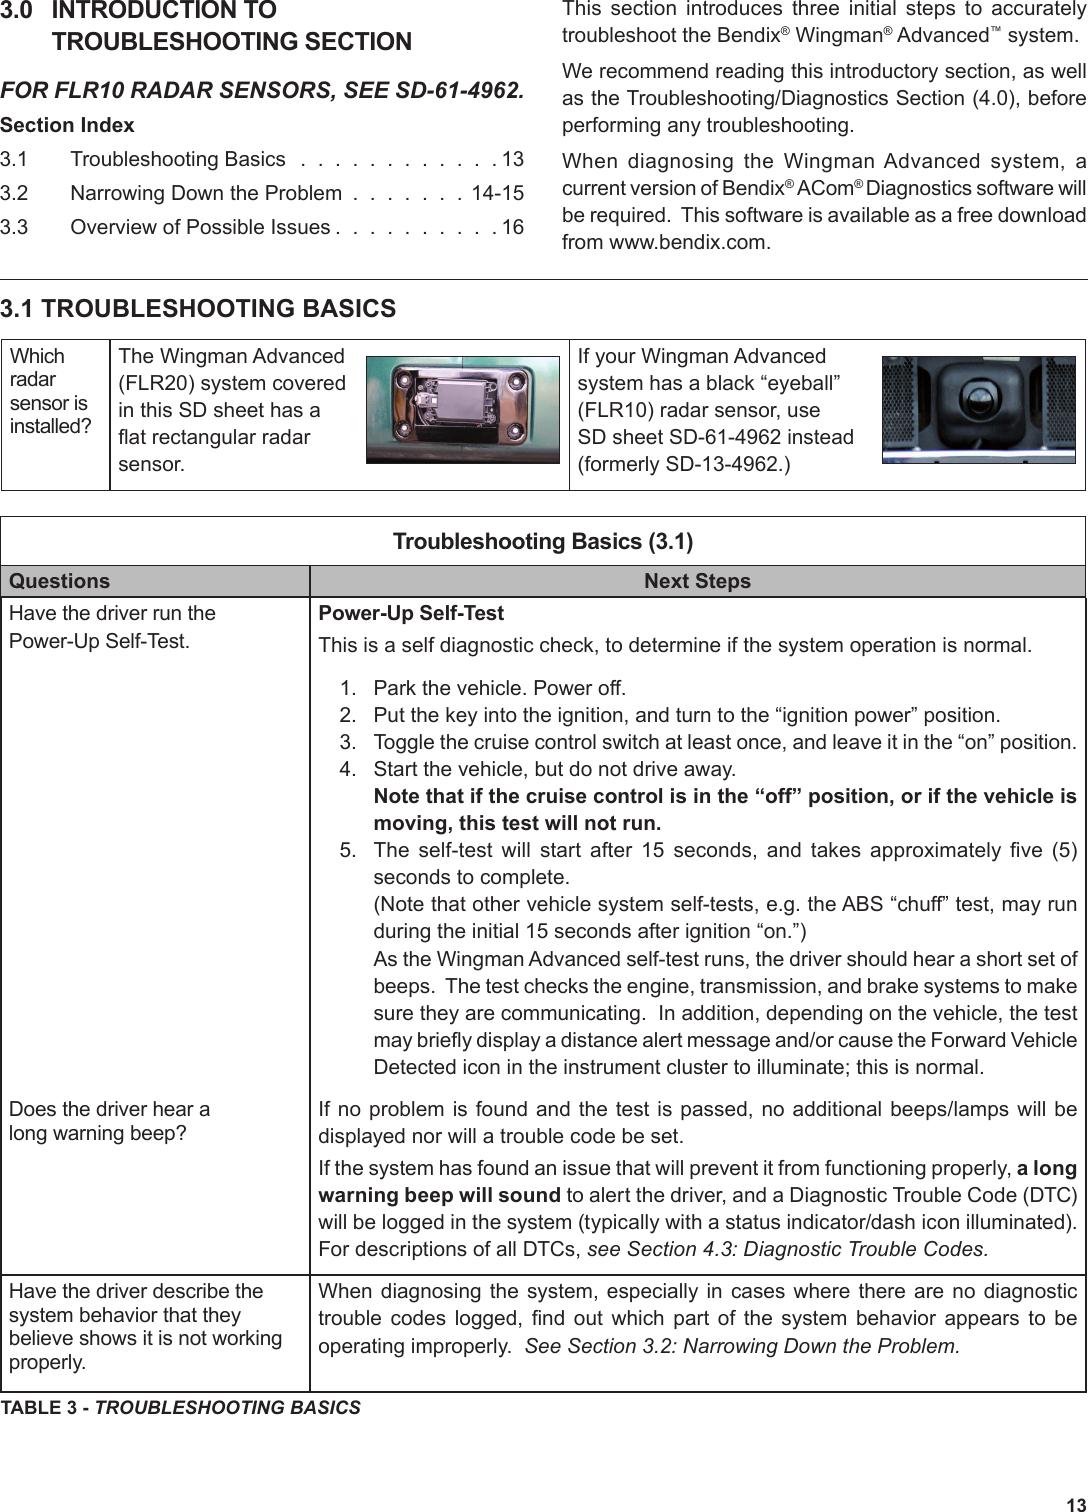 Bendix Bw2907 Users Manual